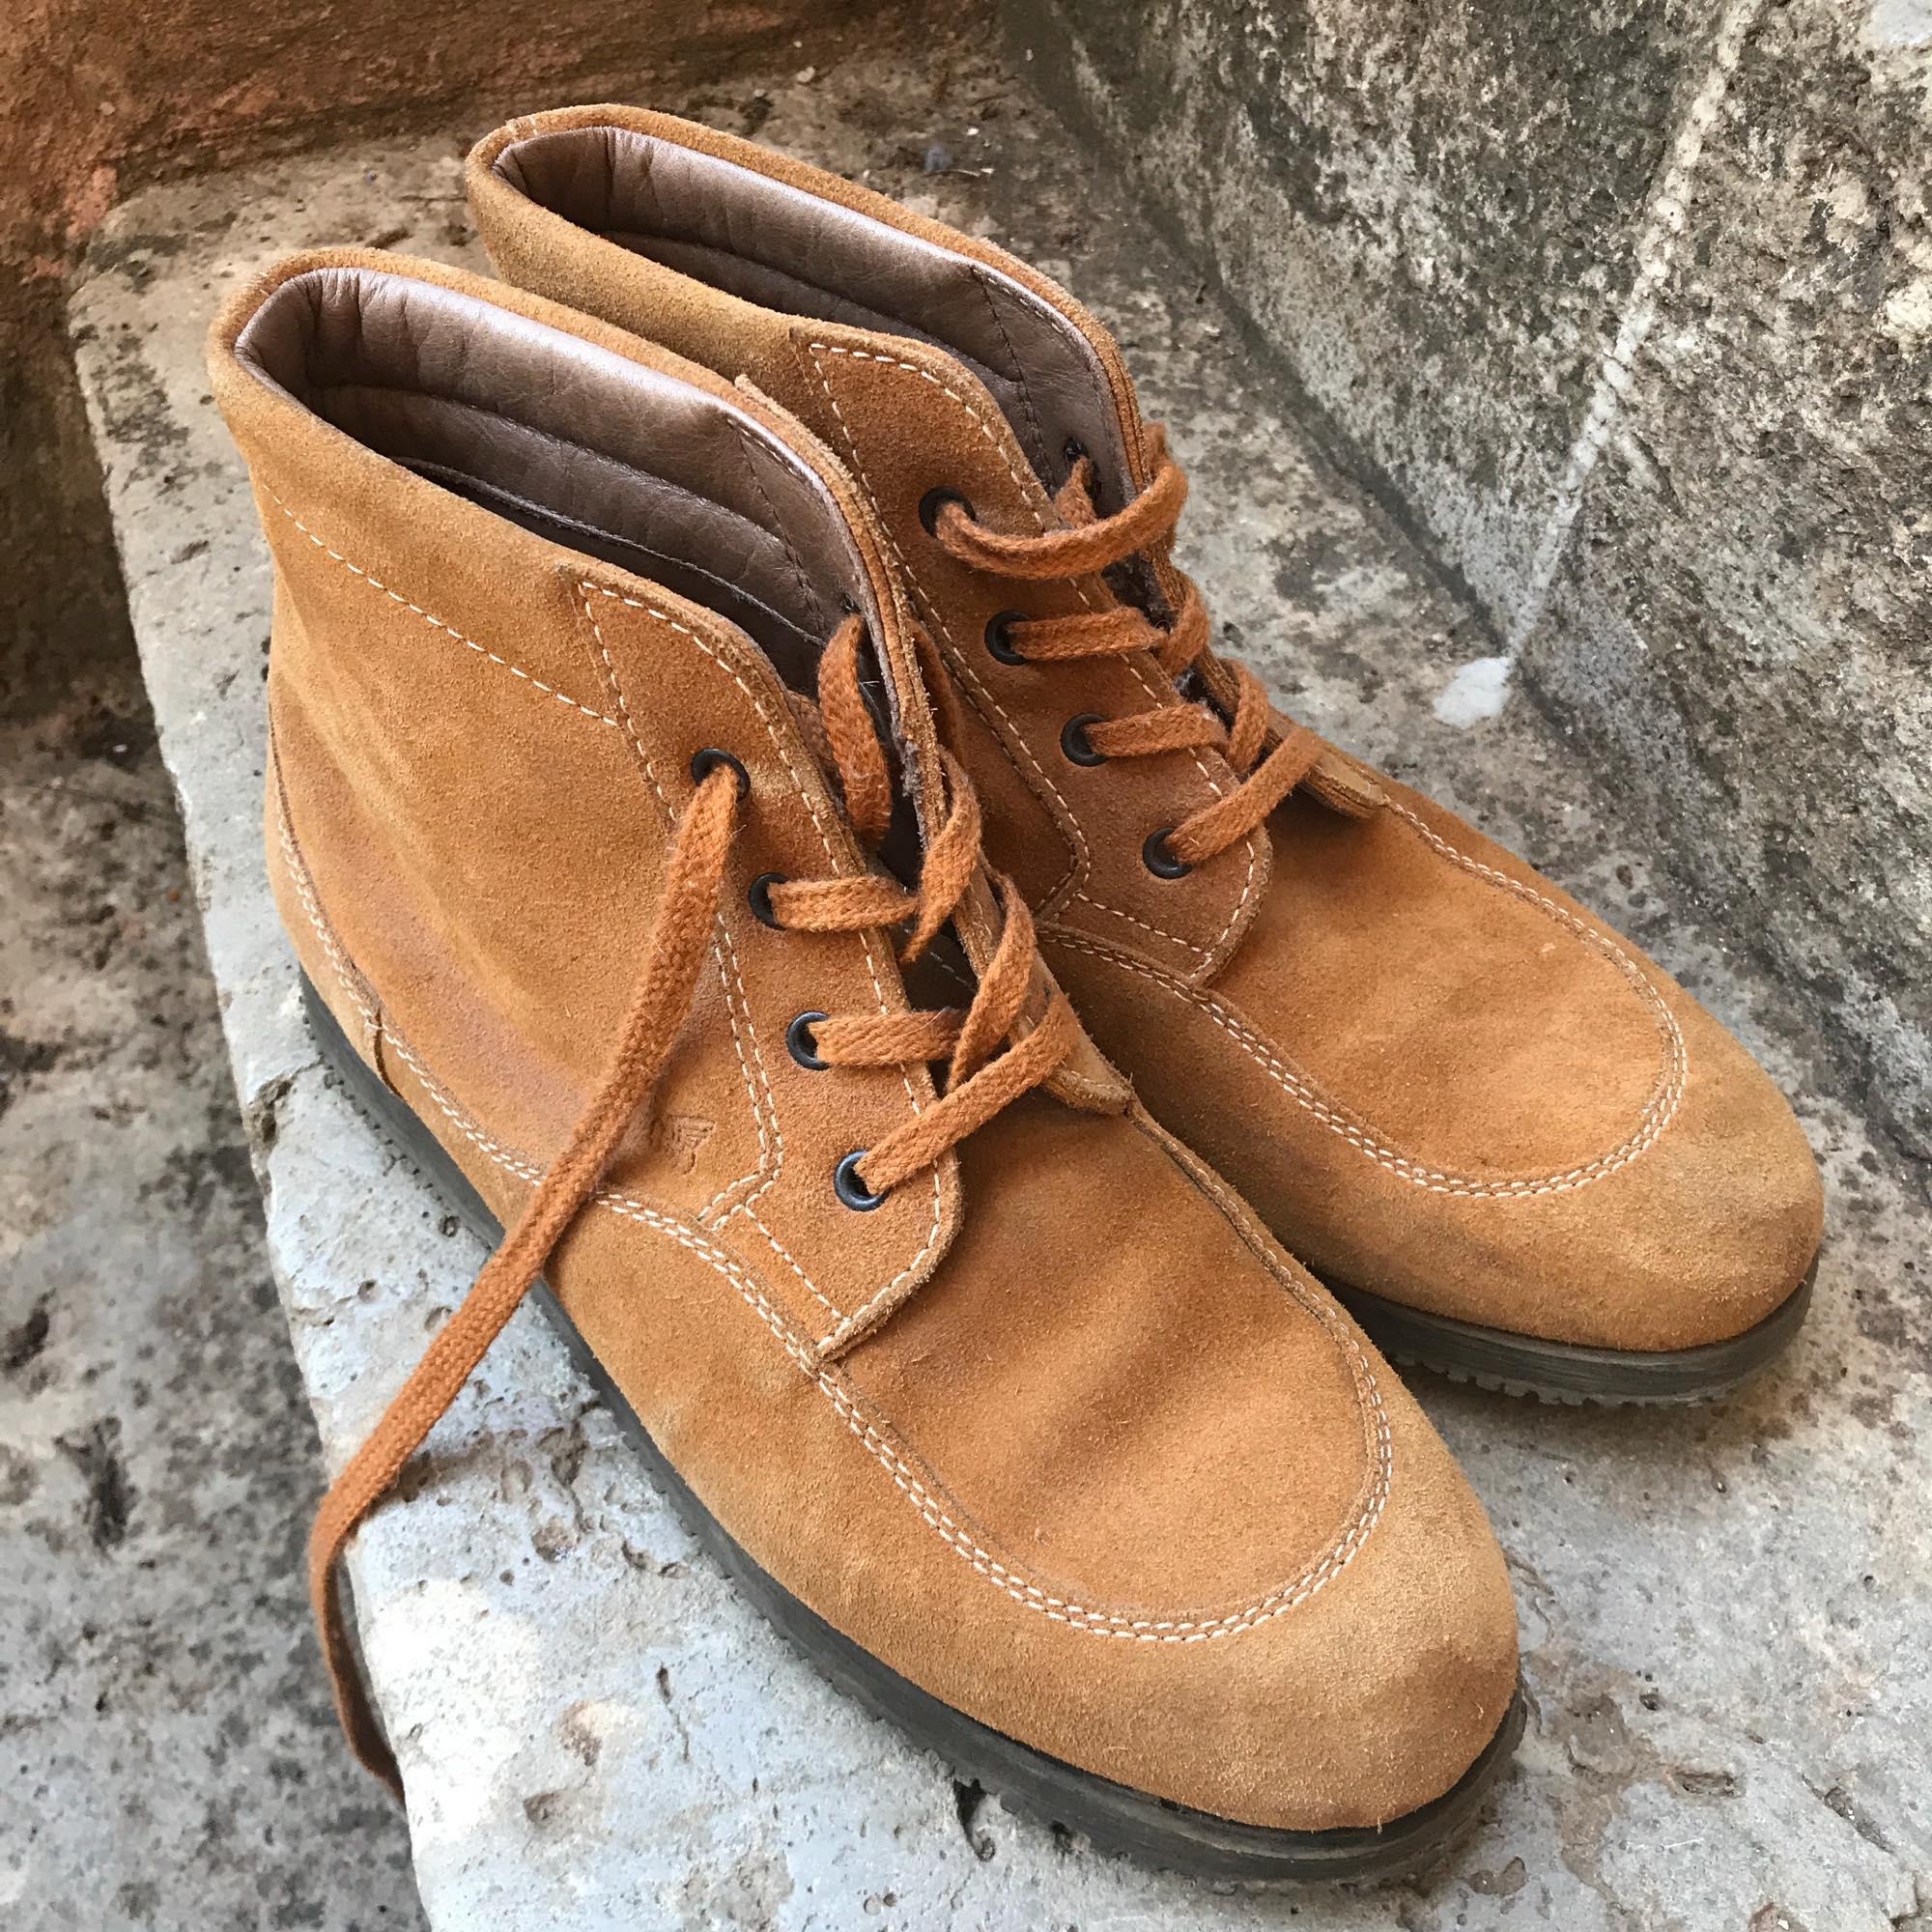 Bottines & low boots plates HOGAN Beige, camel